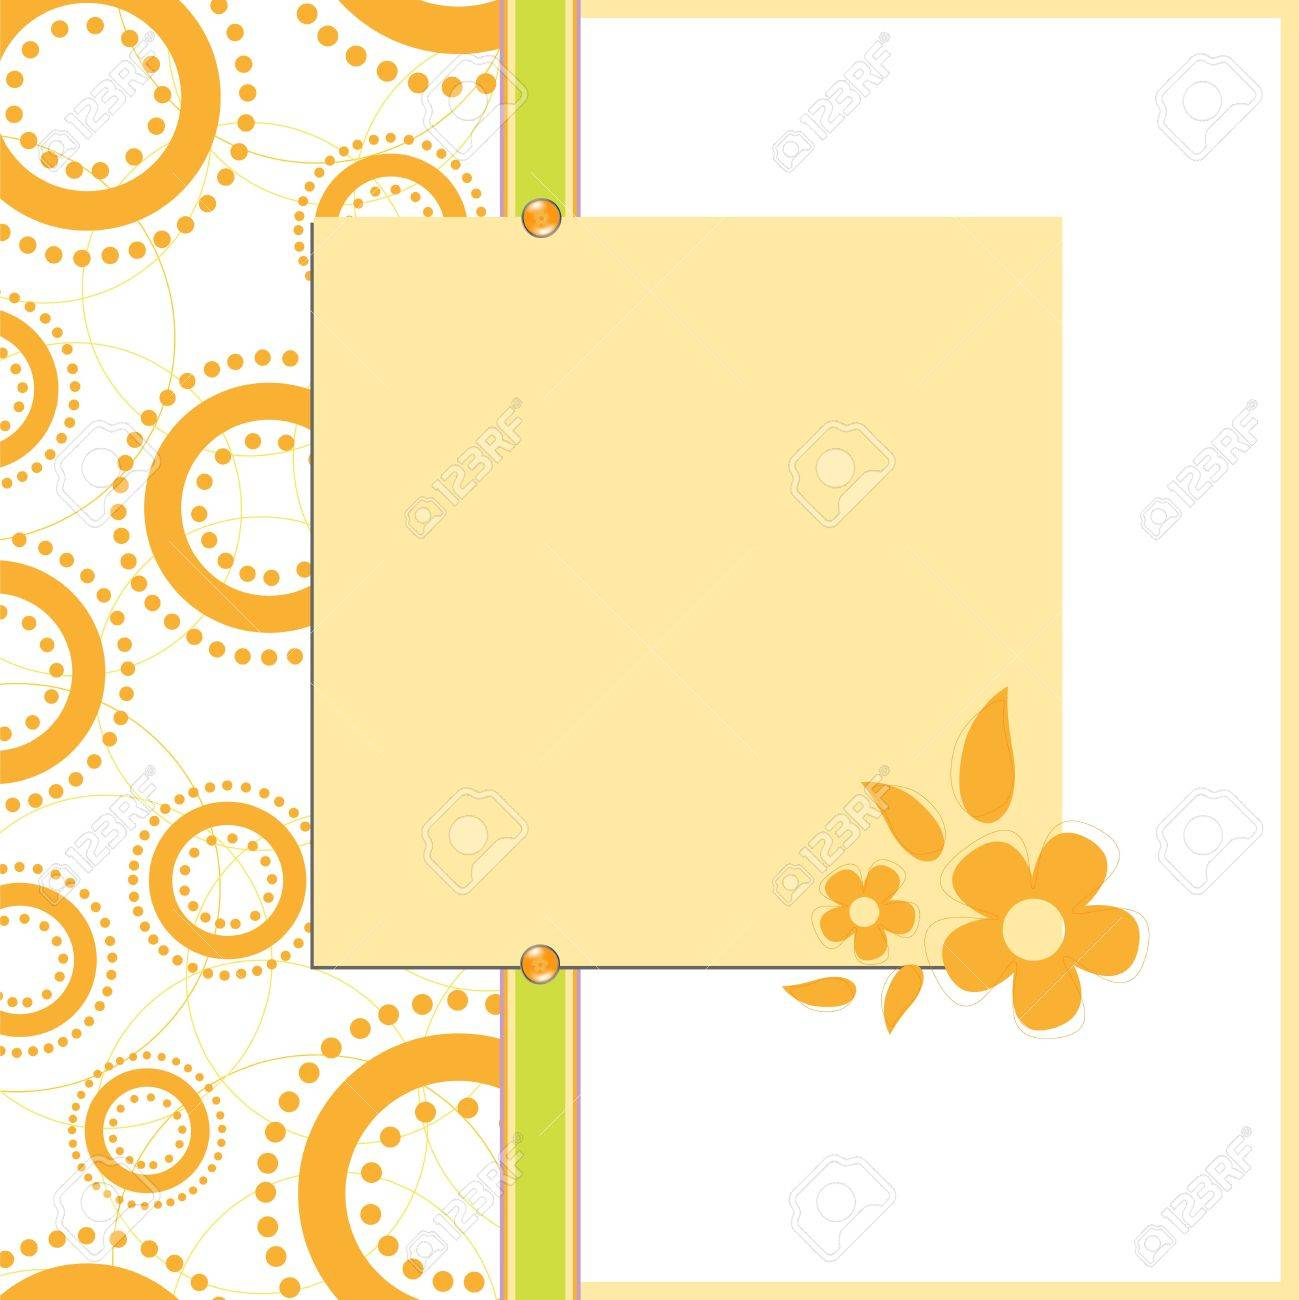 Blank Template For Orange Greetings Card, Postcard Or Photo Farme ...